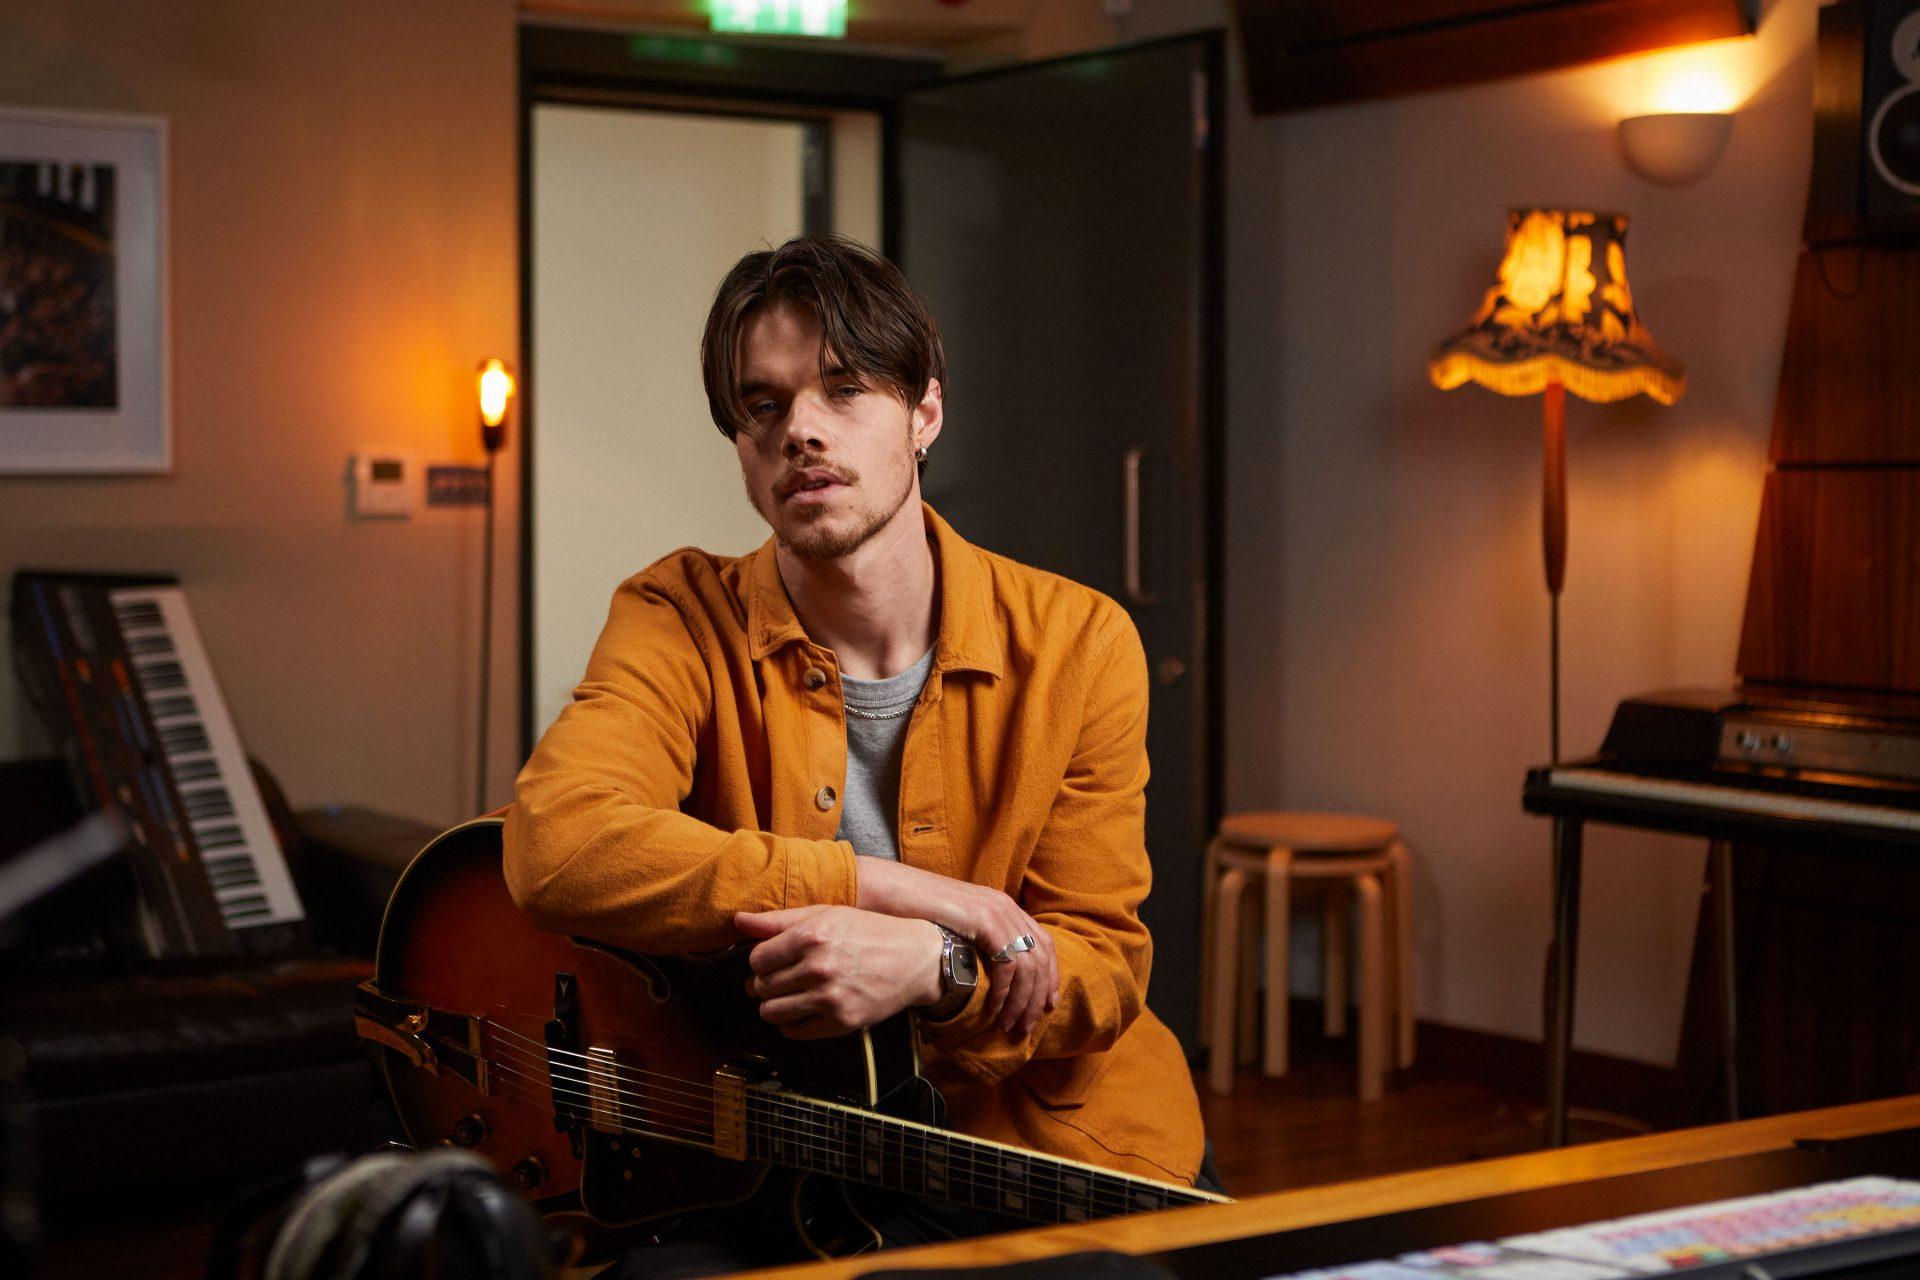 Musician Oscar Jerome giving a BandLab Tutorial